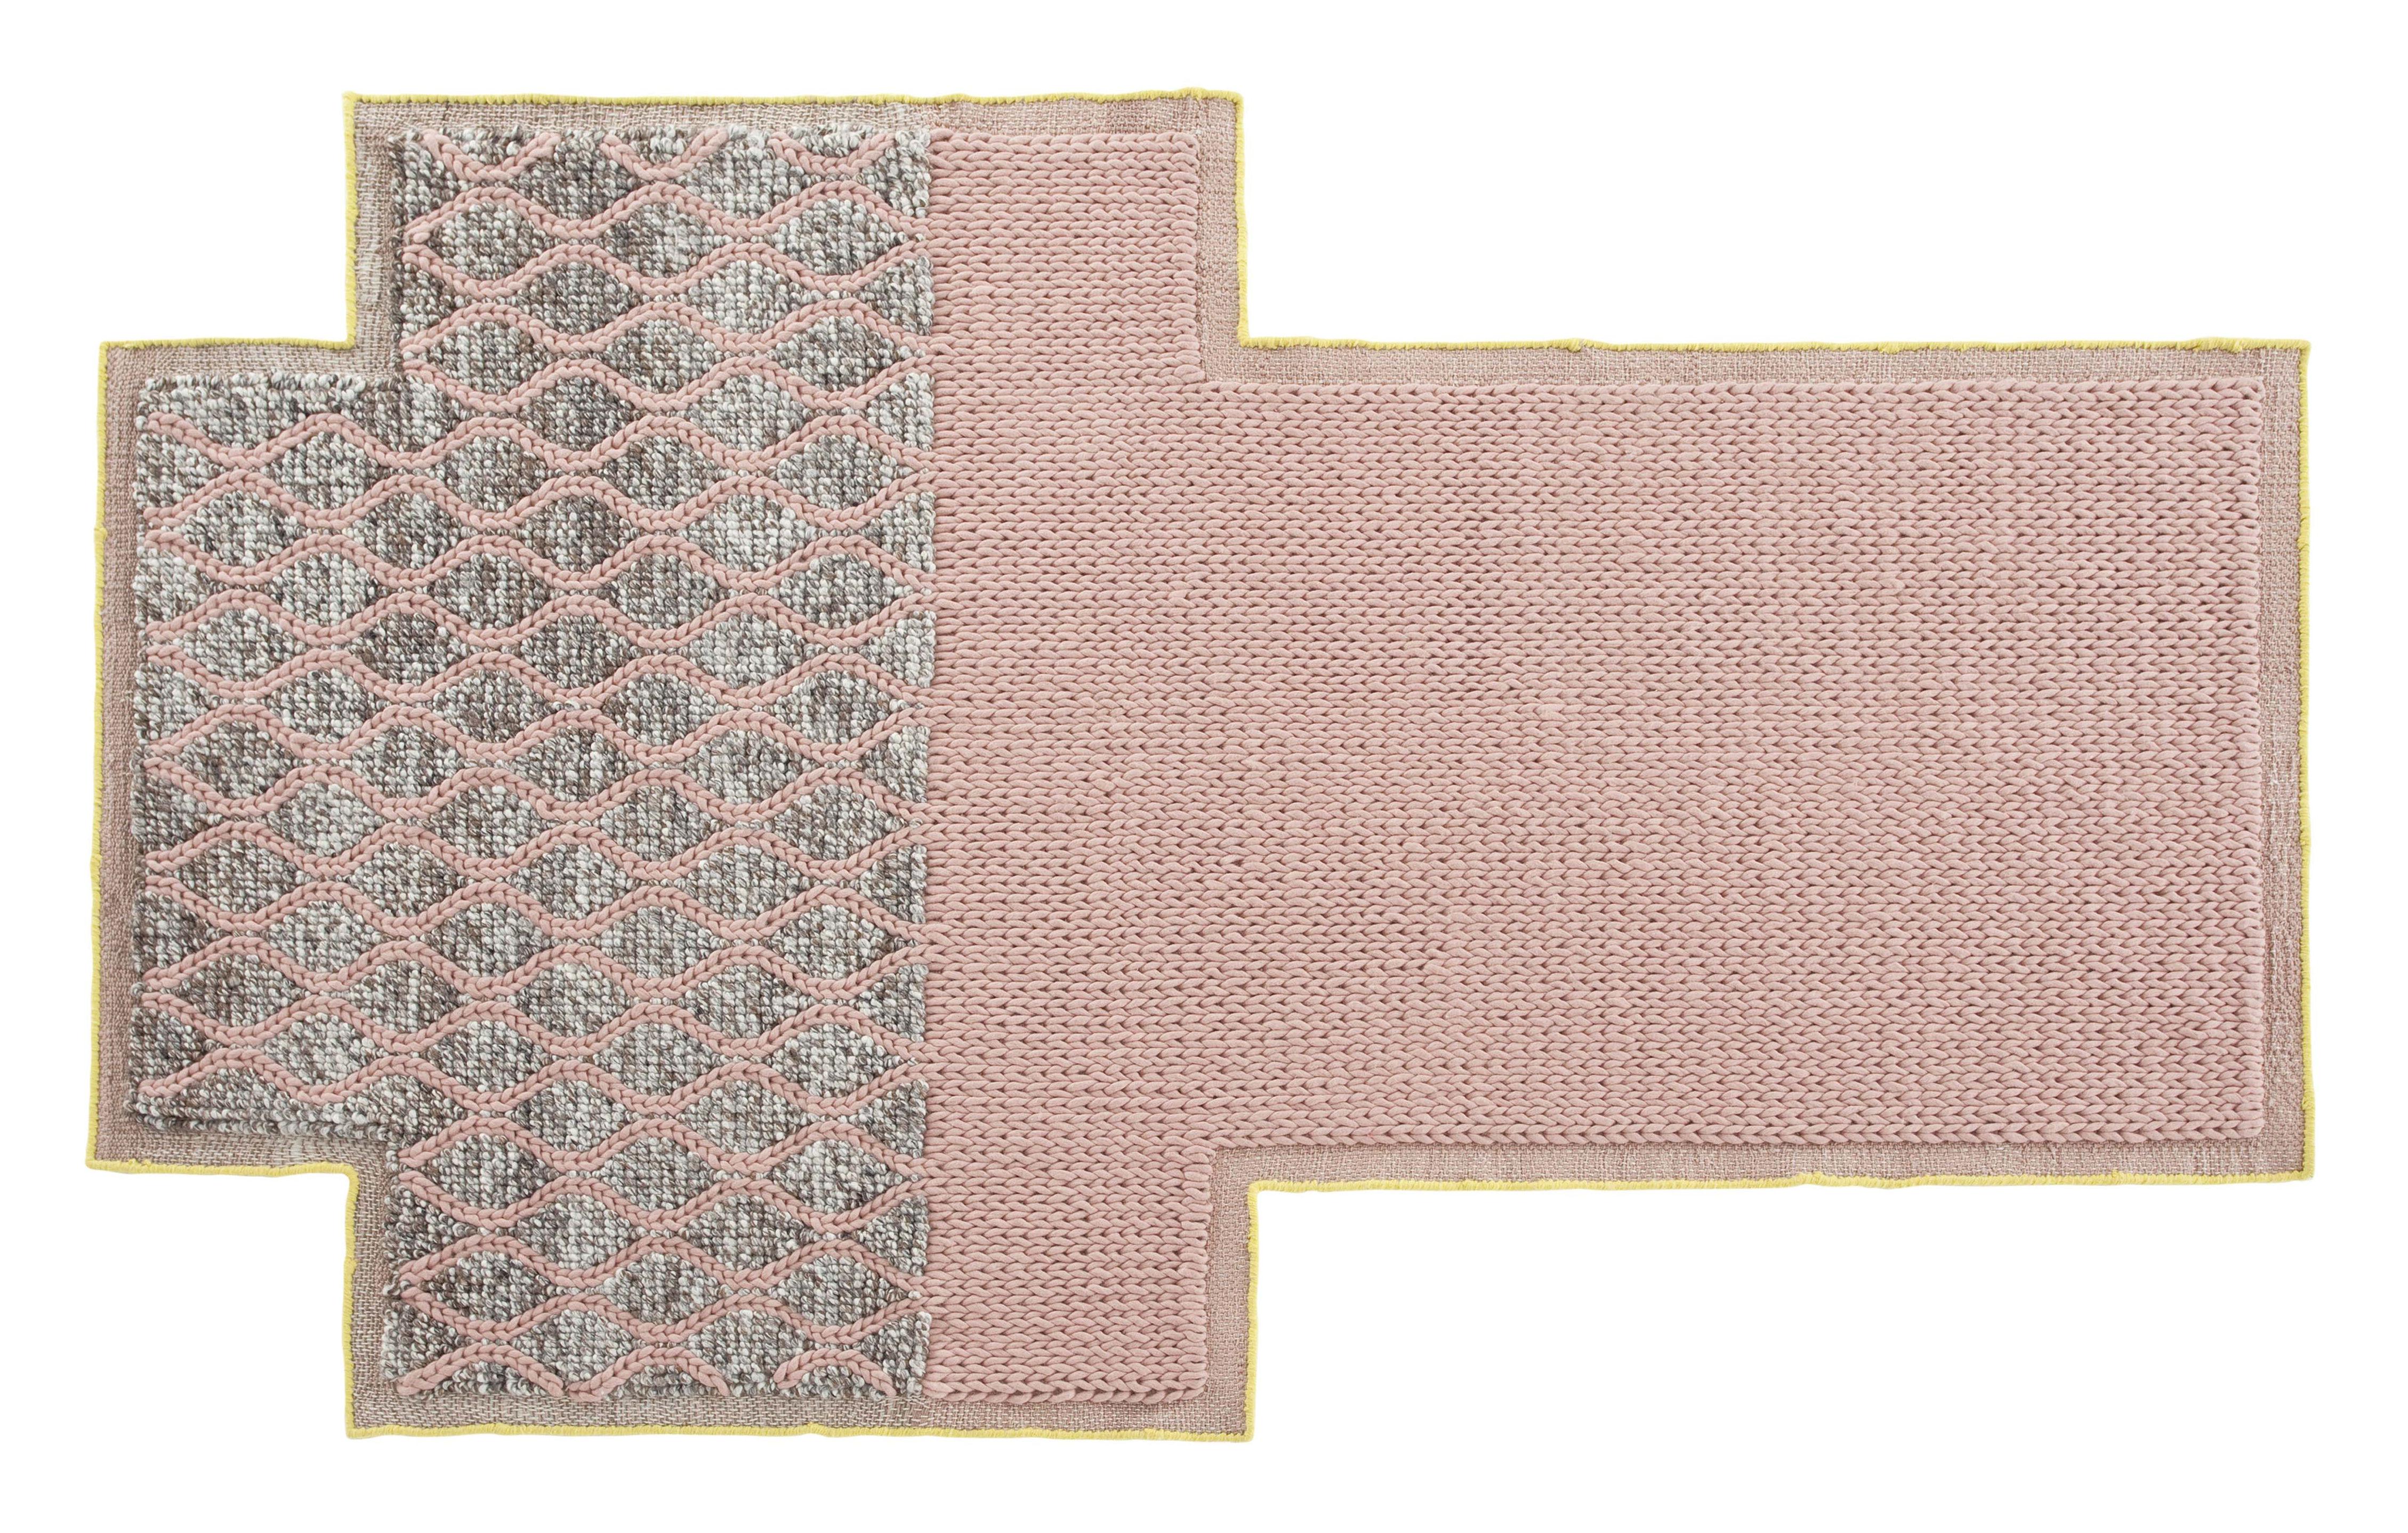 Mangas Space Rhombus  250 x 160 cm  Gan  Teppich